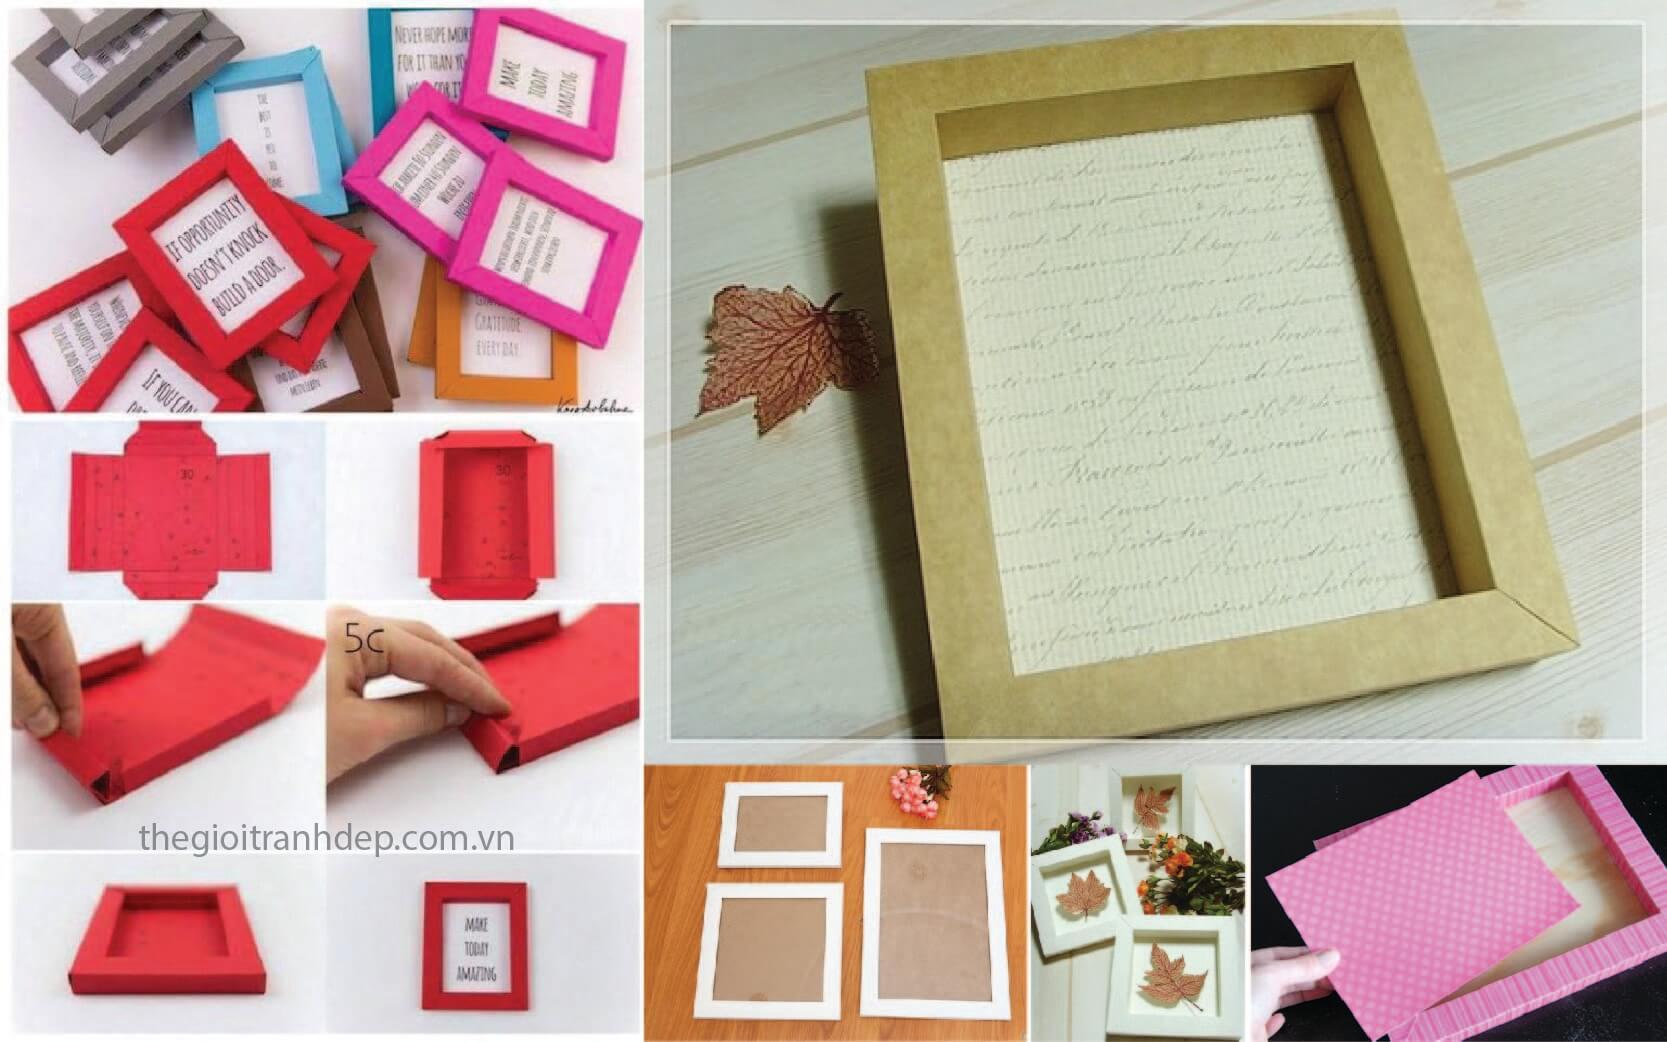 khung-tranh-treo-tuong-handmade